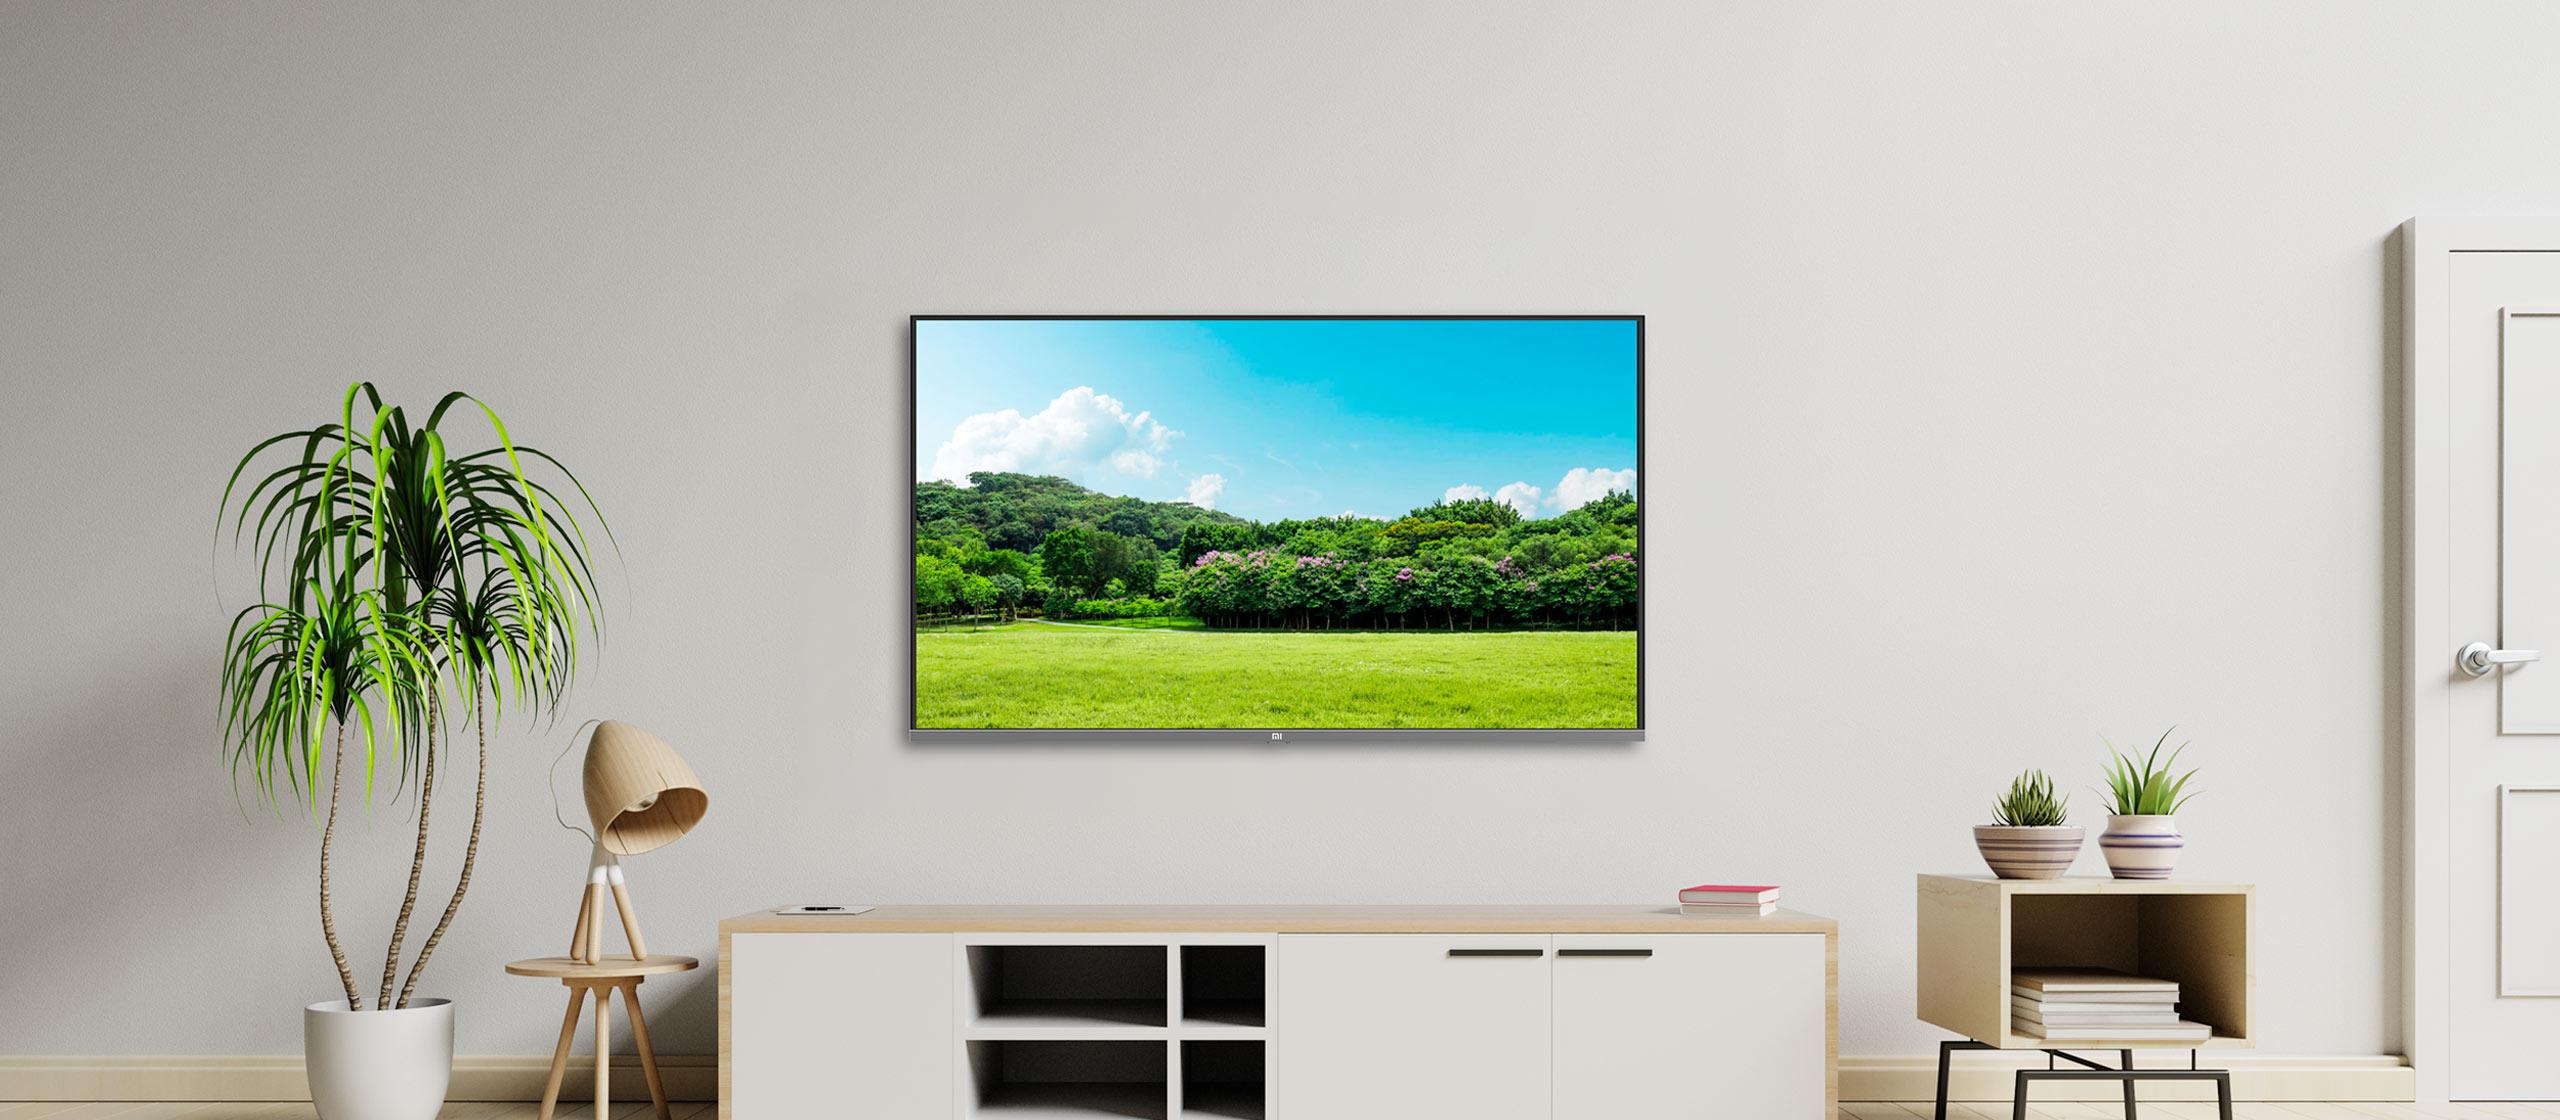 telewizor Xiaomi Mi TV 4A 40 Horizon Edition Smart TV Android TV